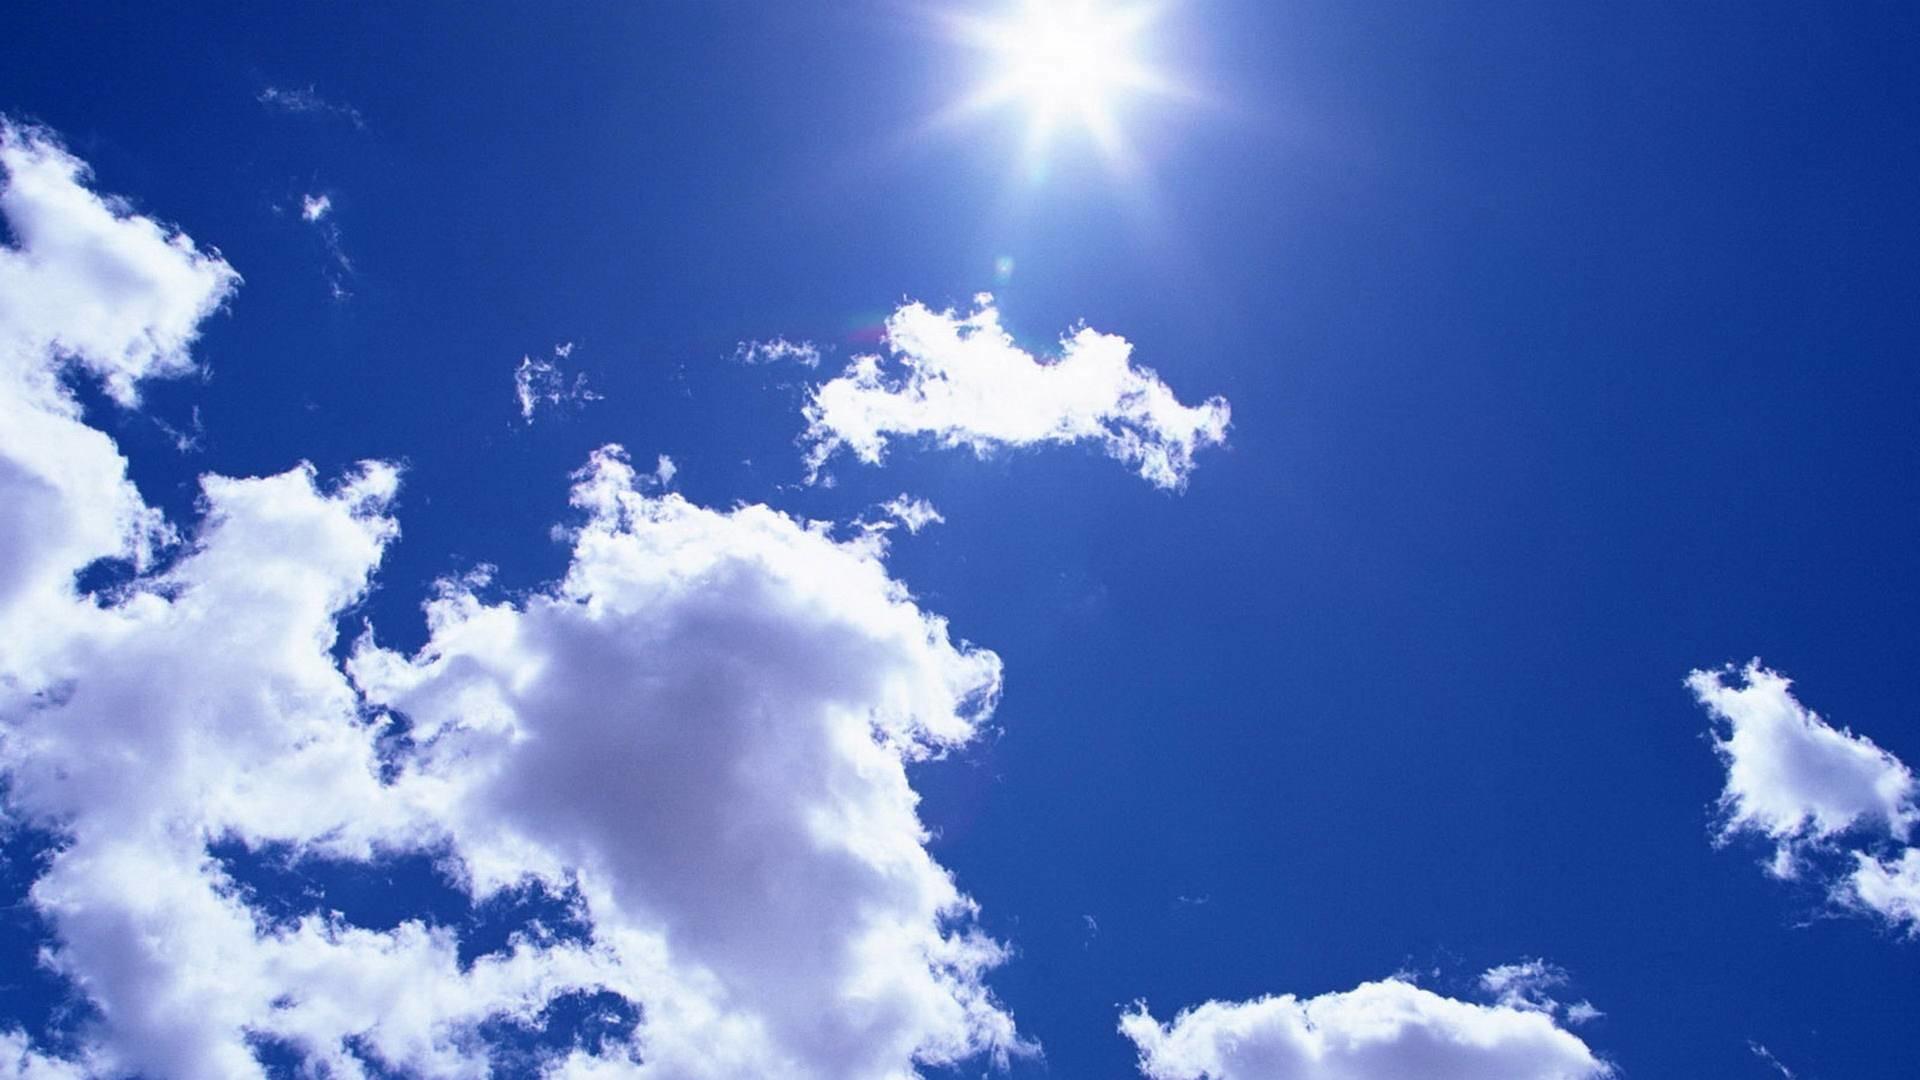 2100x1254 Best 25 Blue Sky Clouds ideas on Pinterest | Cloud ceiling, Sky .